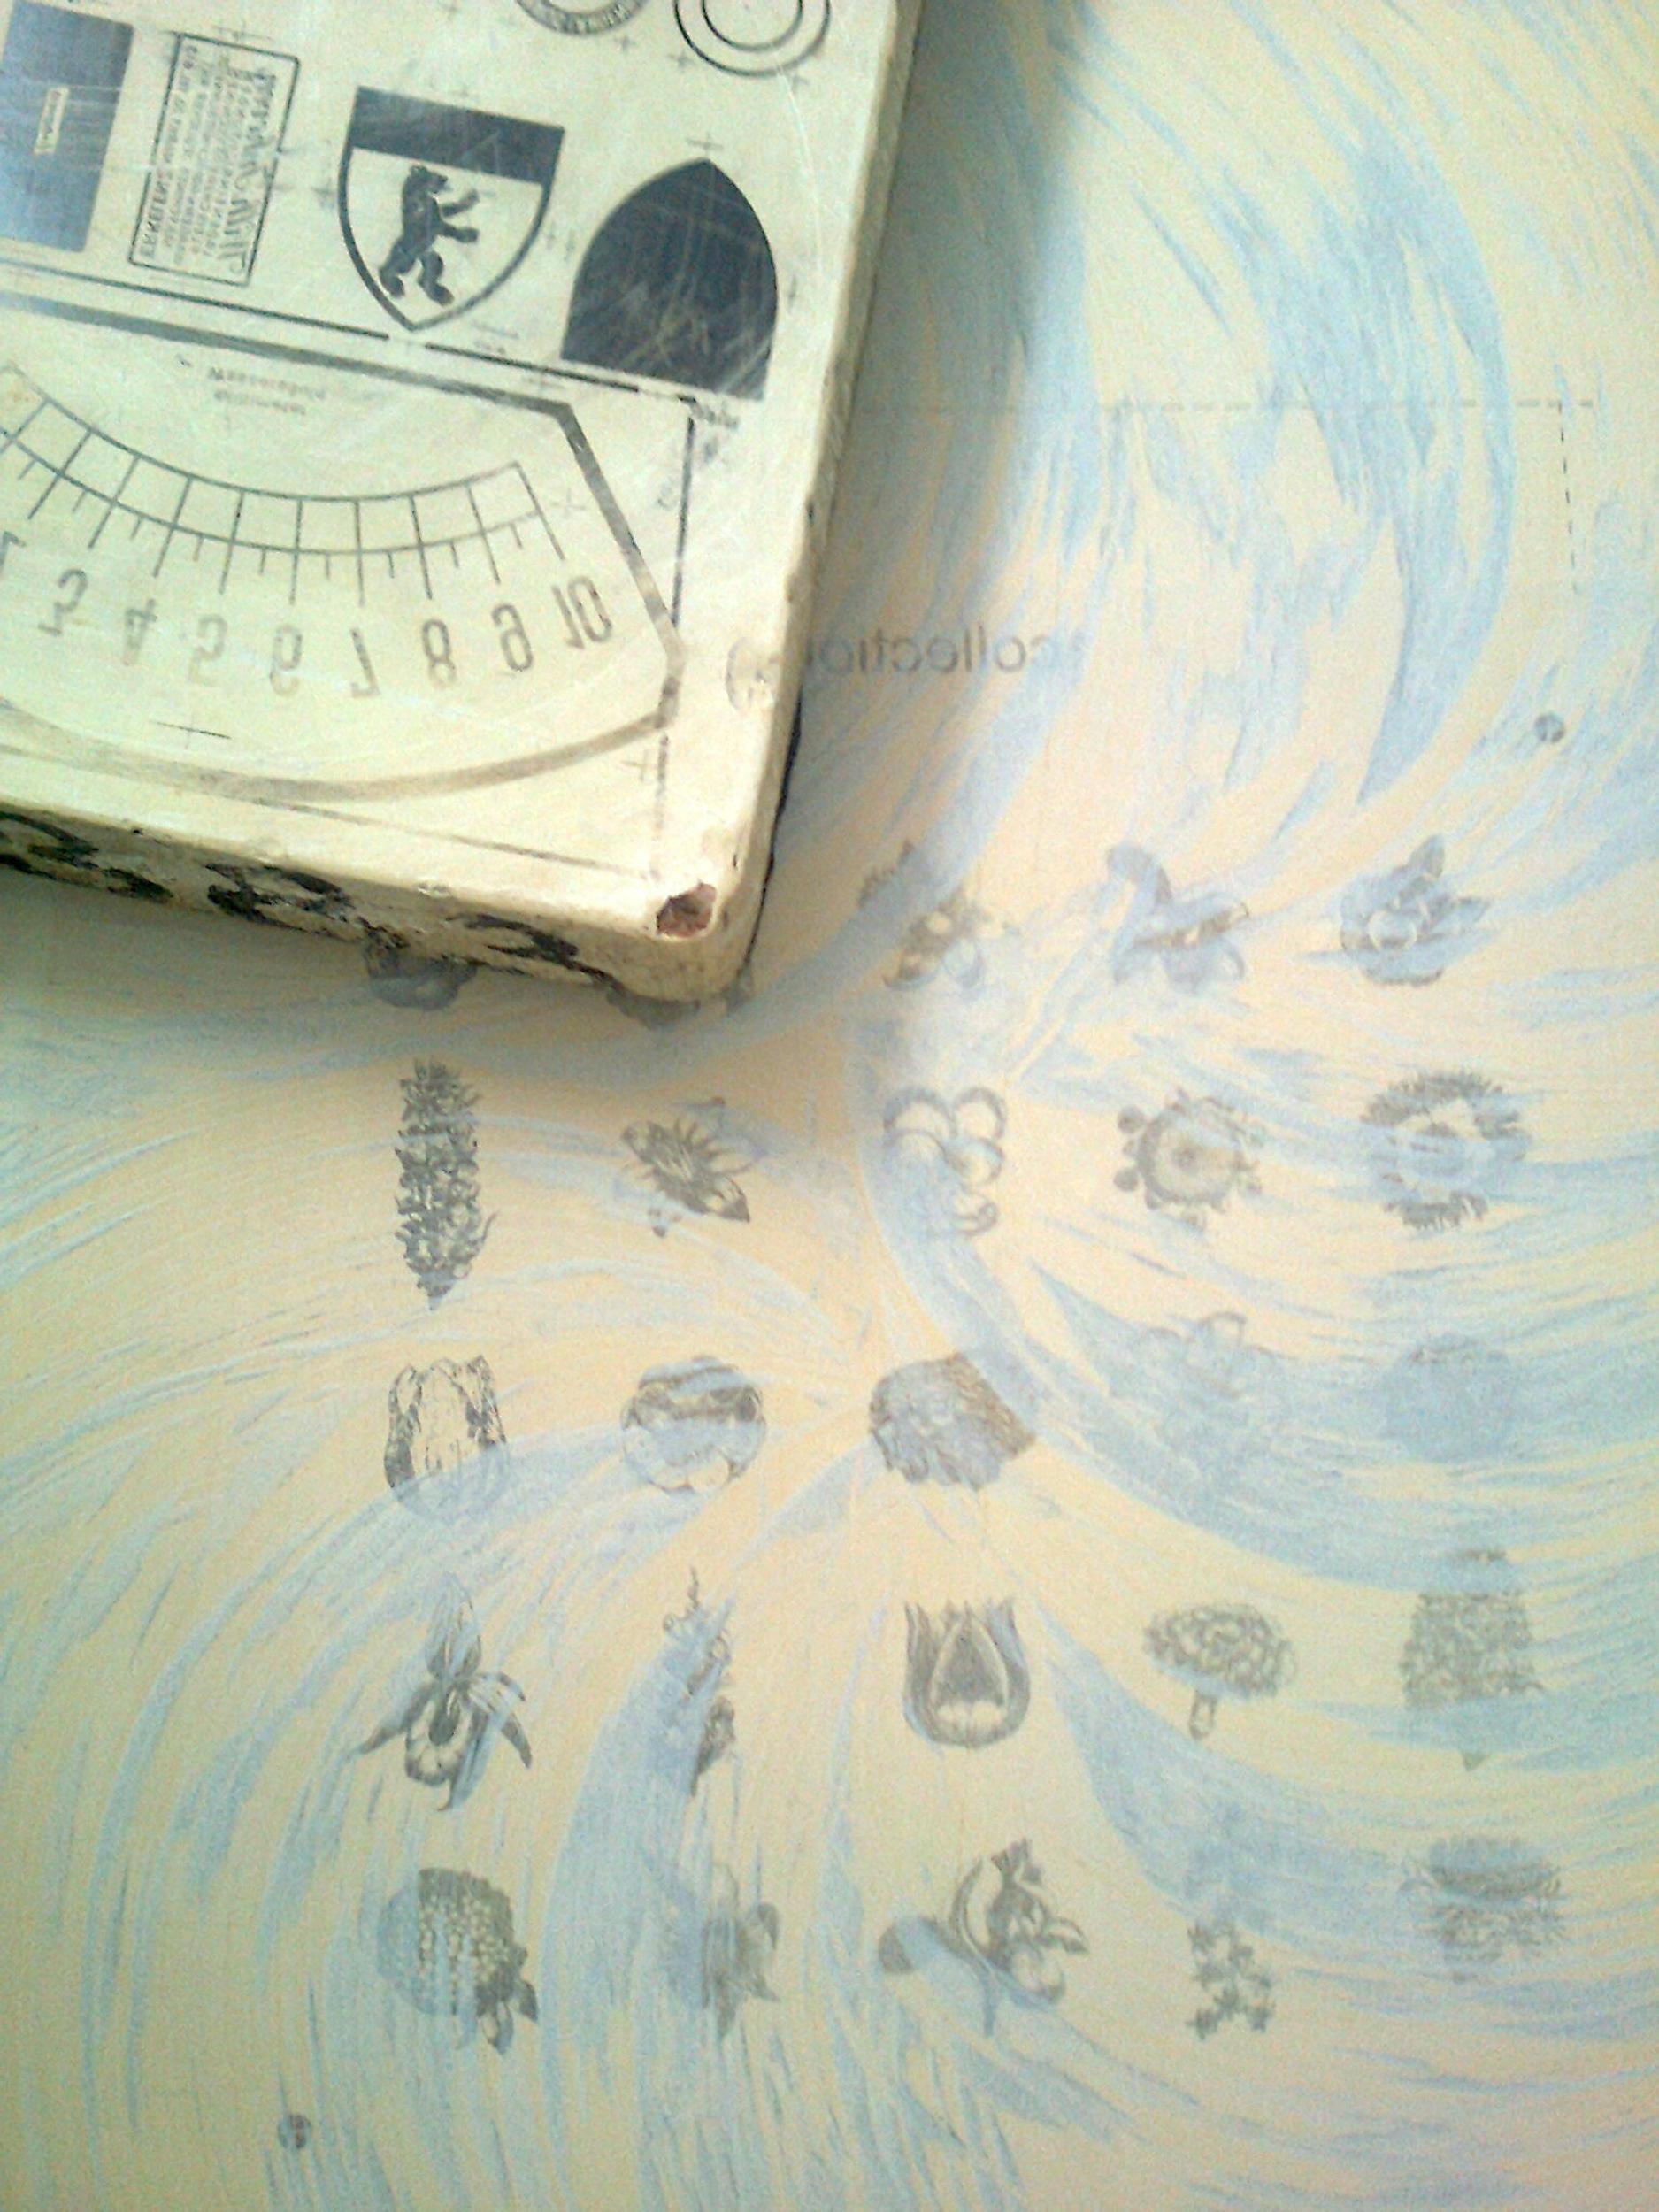 testimonial-i-iii-iii-progress-documentation-cellphone-sketchbook-025.jpg